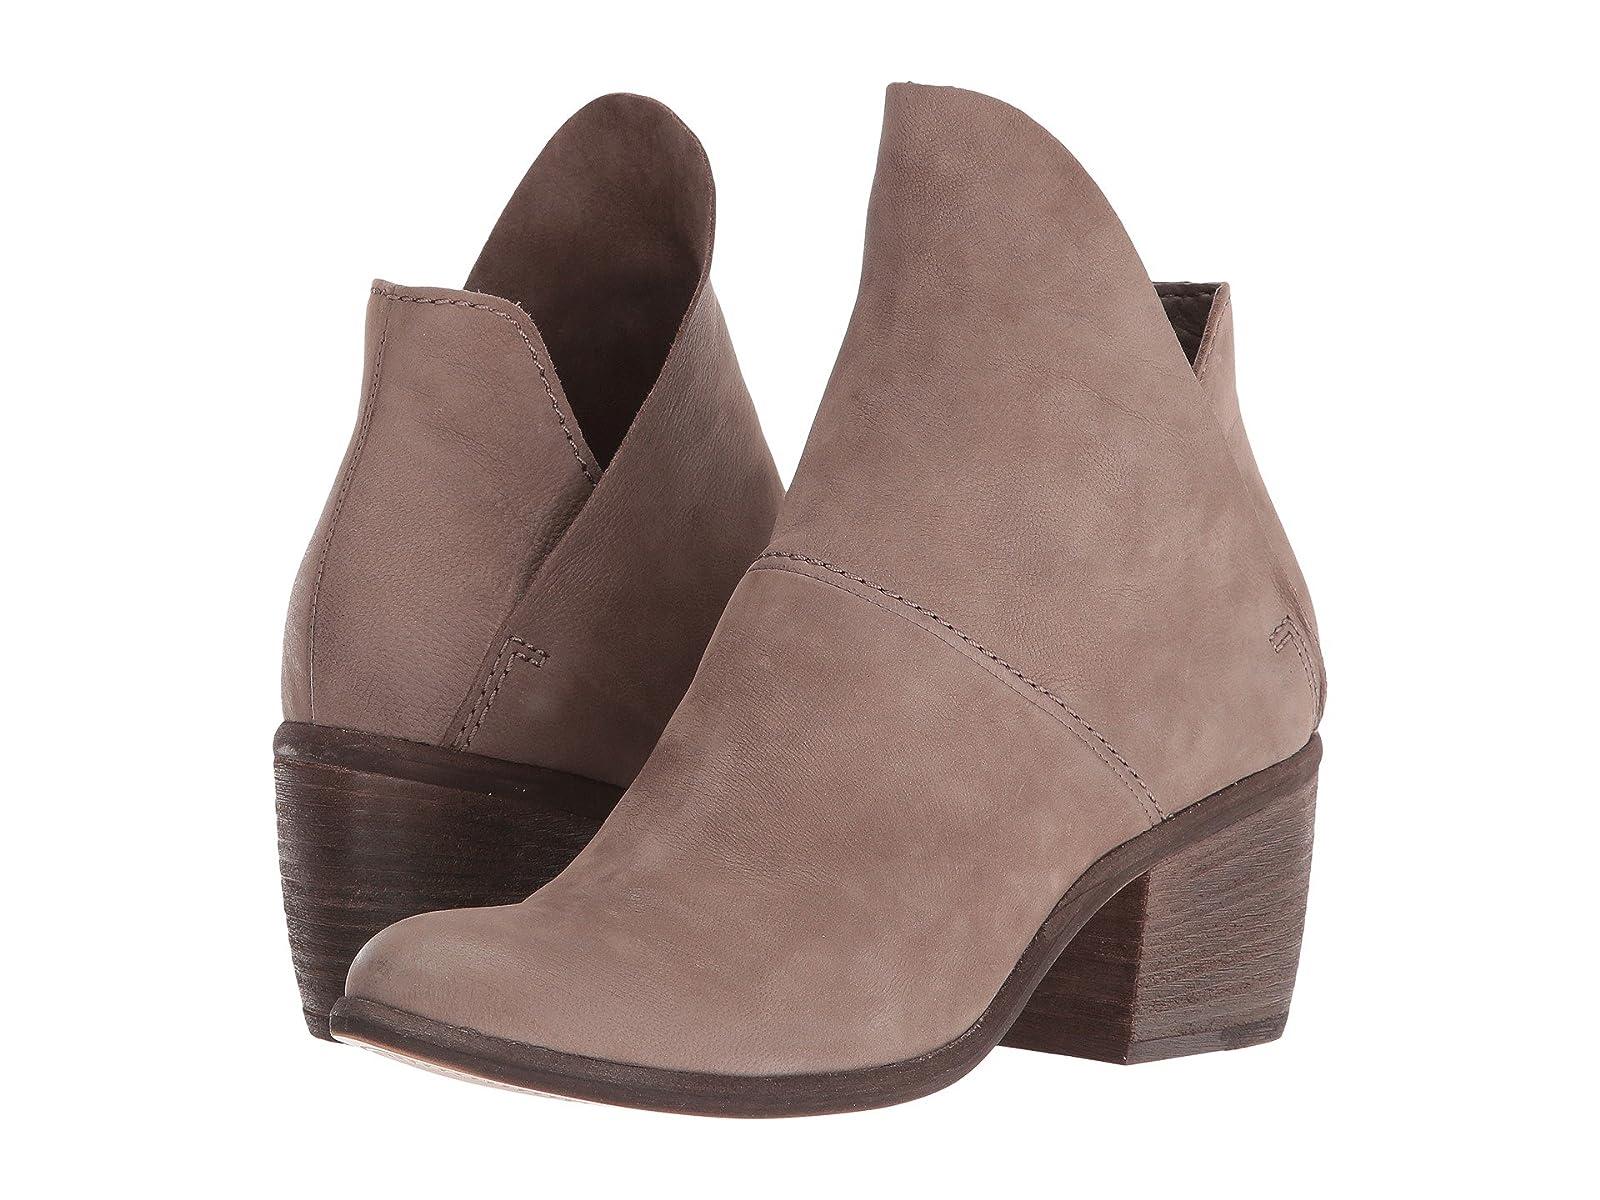 Dolce Vita SalenaCheap and distinctive eye-catching shoes